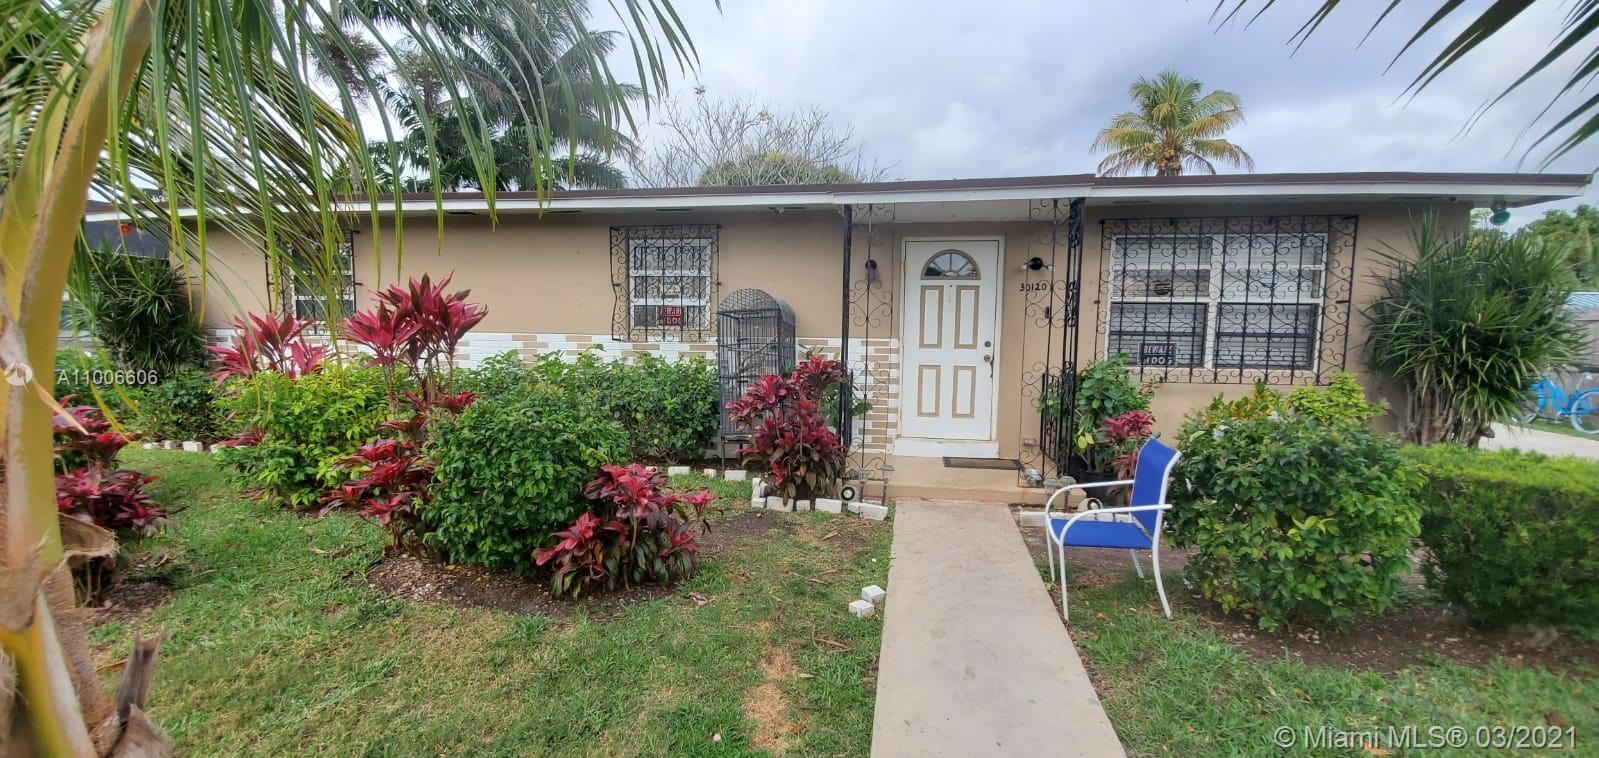 30120 Sw 151st Ave Property Photo